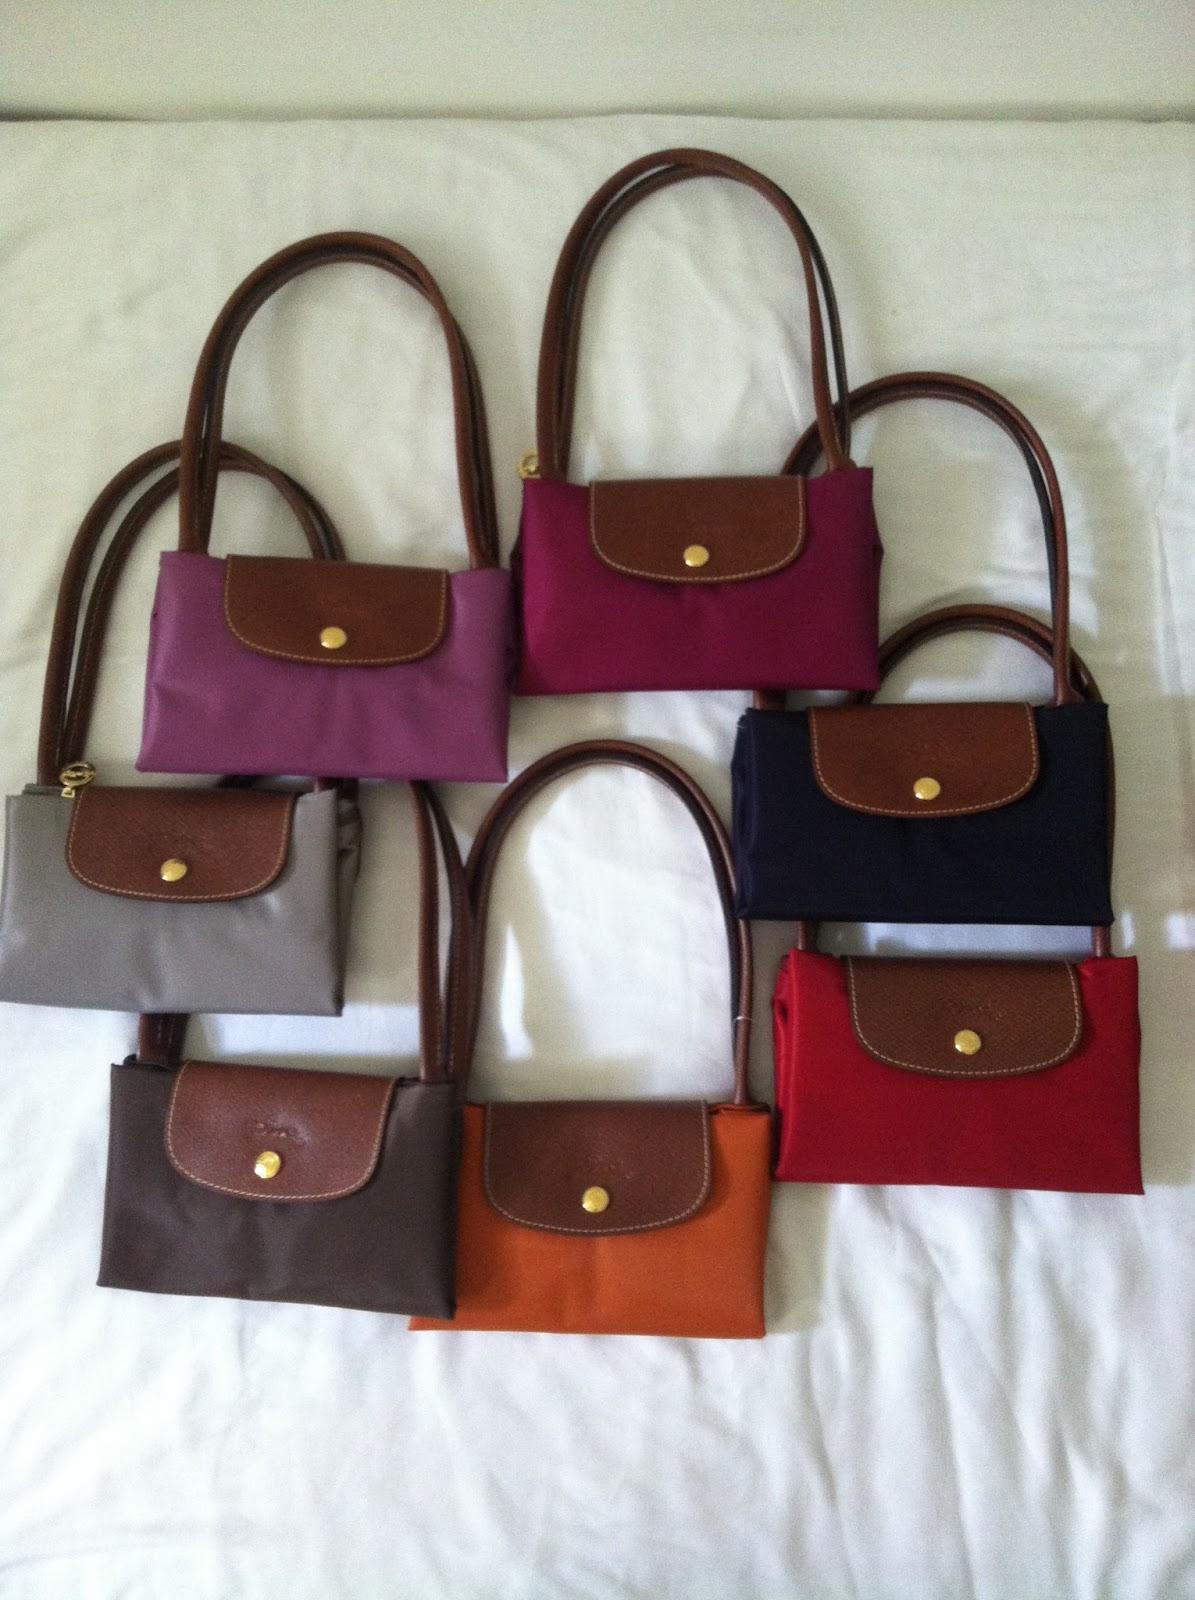 97cd0f0751e Steal My Bag  LONGCHAMP LE PLIAGE SHOPPING BAG SIZE M+LONG HANDLE